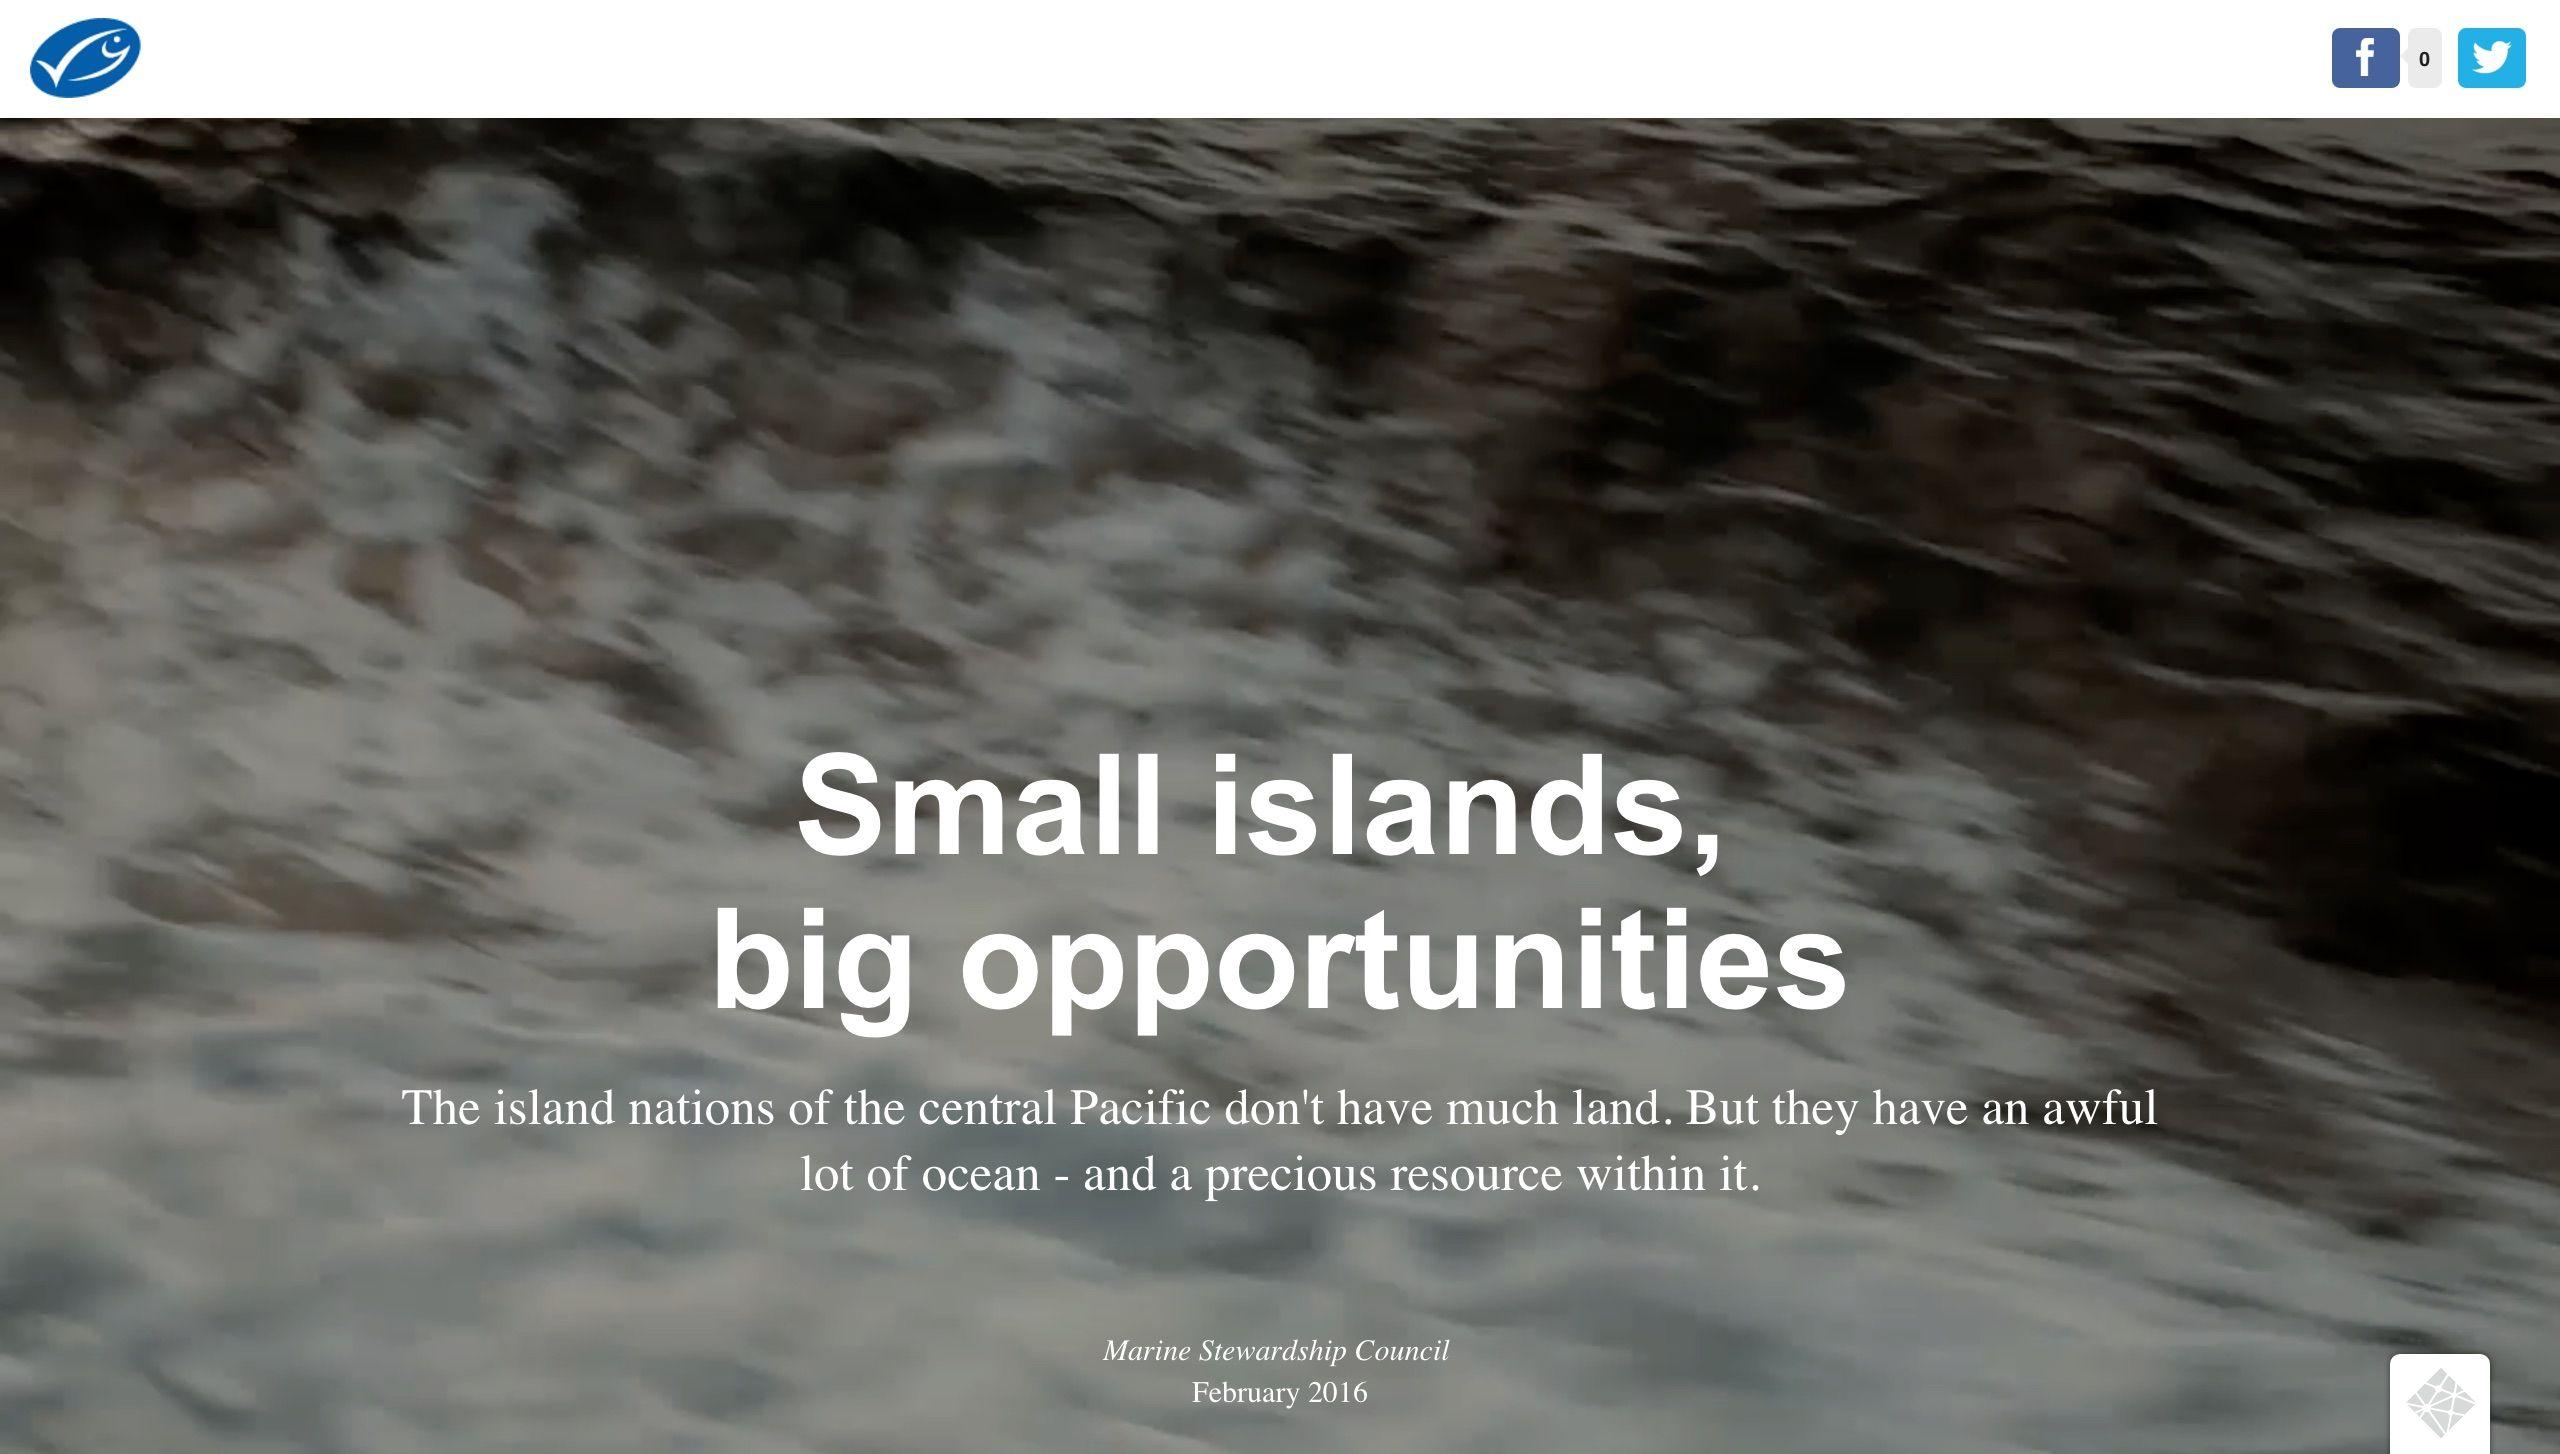 Small islands, big opportunities, MSC